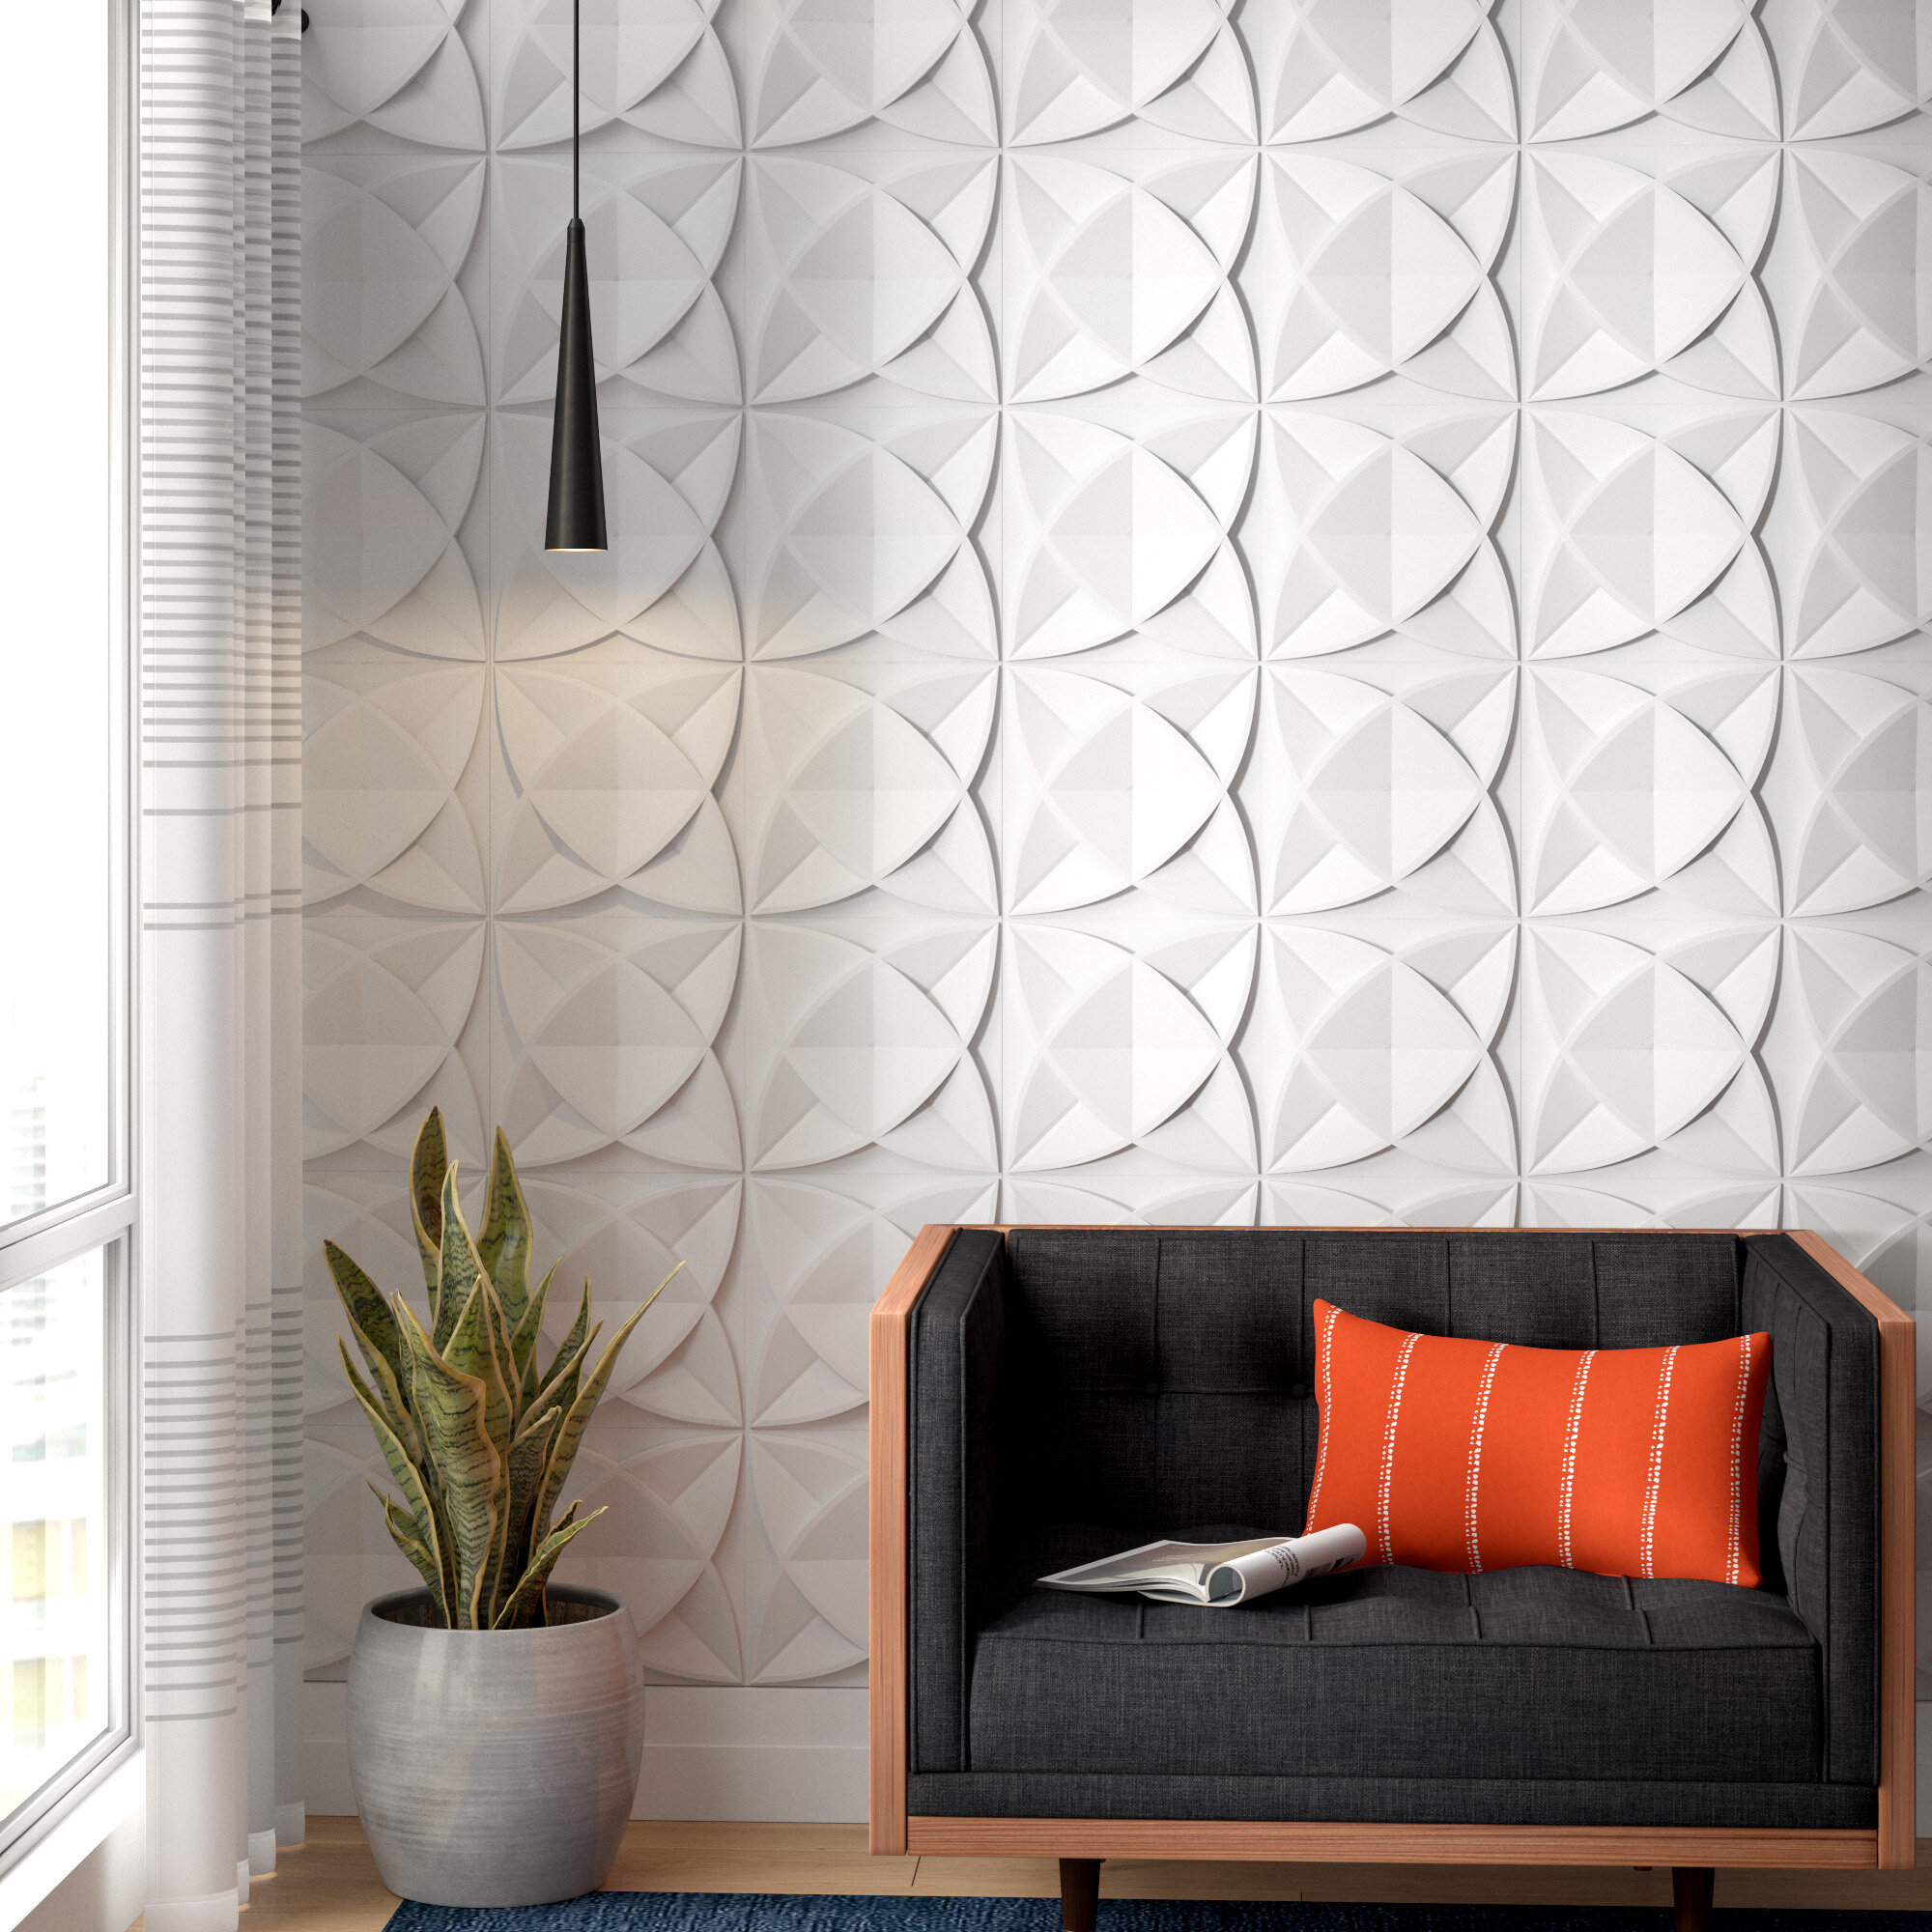 Keck Plant Fiber 11 8 L X 11 8 W 3d Embossed Wallpaper Panel